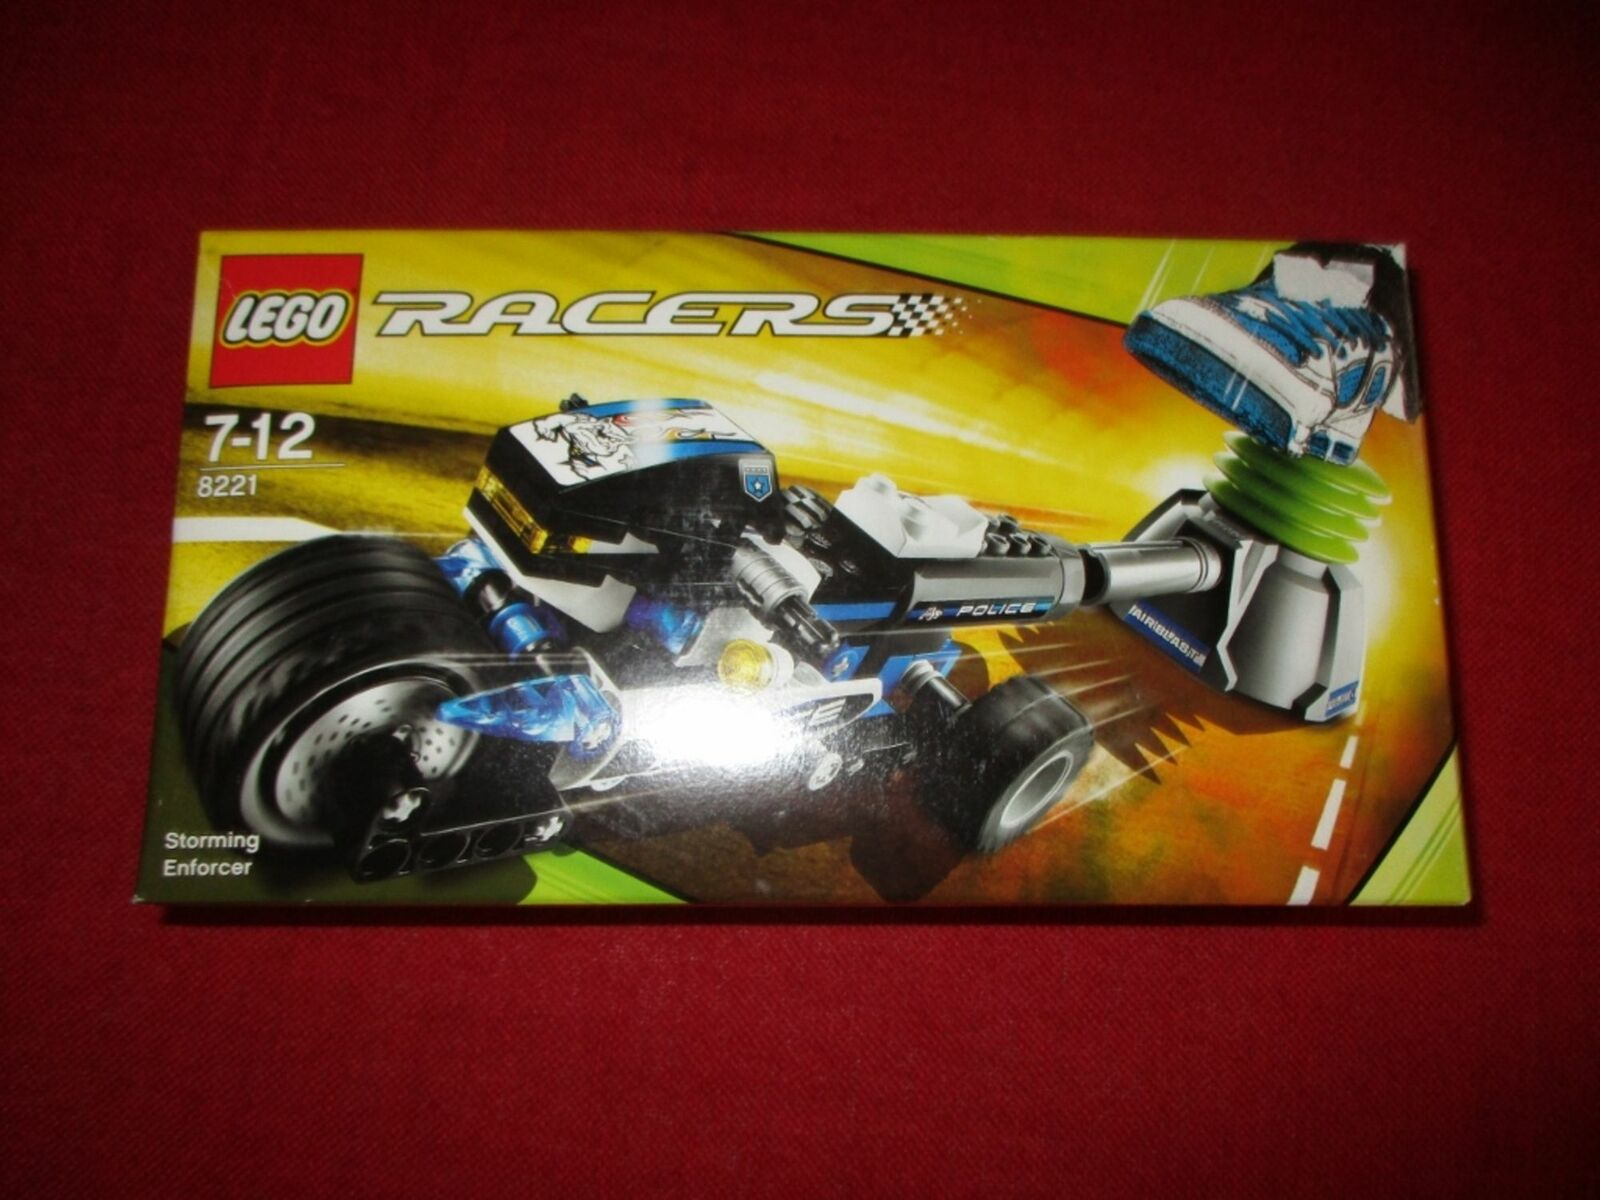 LEGO ® Racers 8221  STORMING ENFORCER NUOVO OVP  wholesape economico